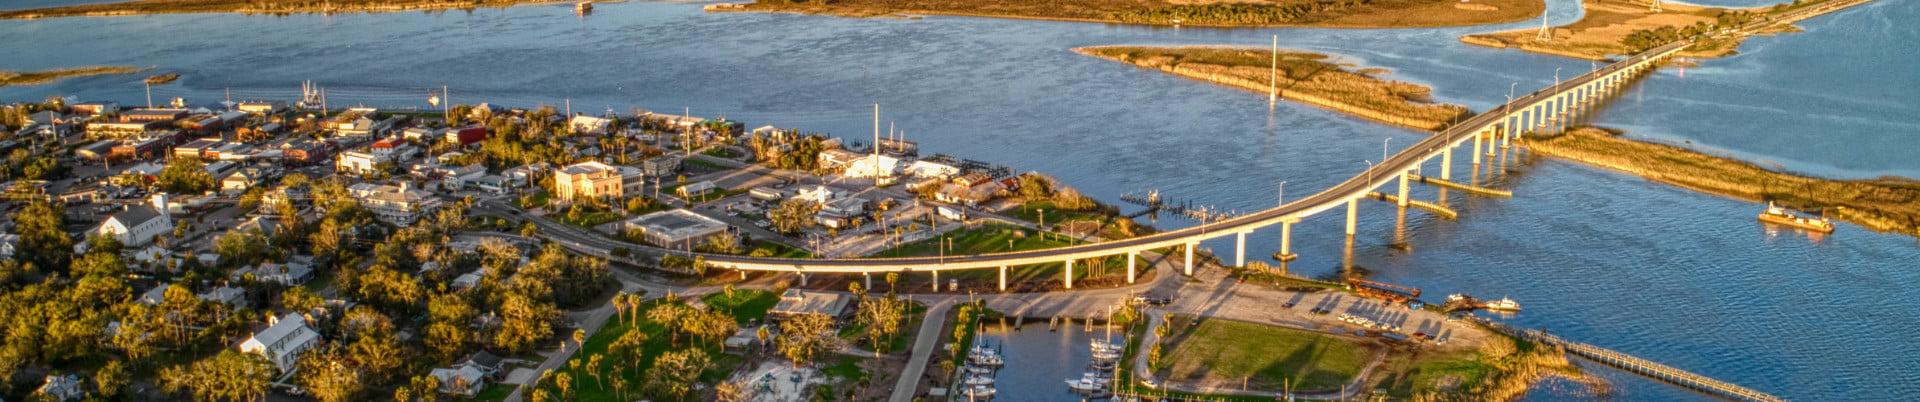 Apalachicola Florida Real Estate